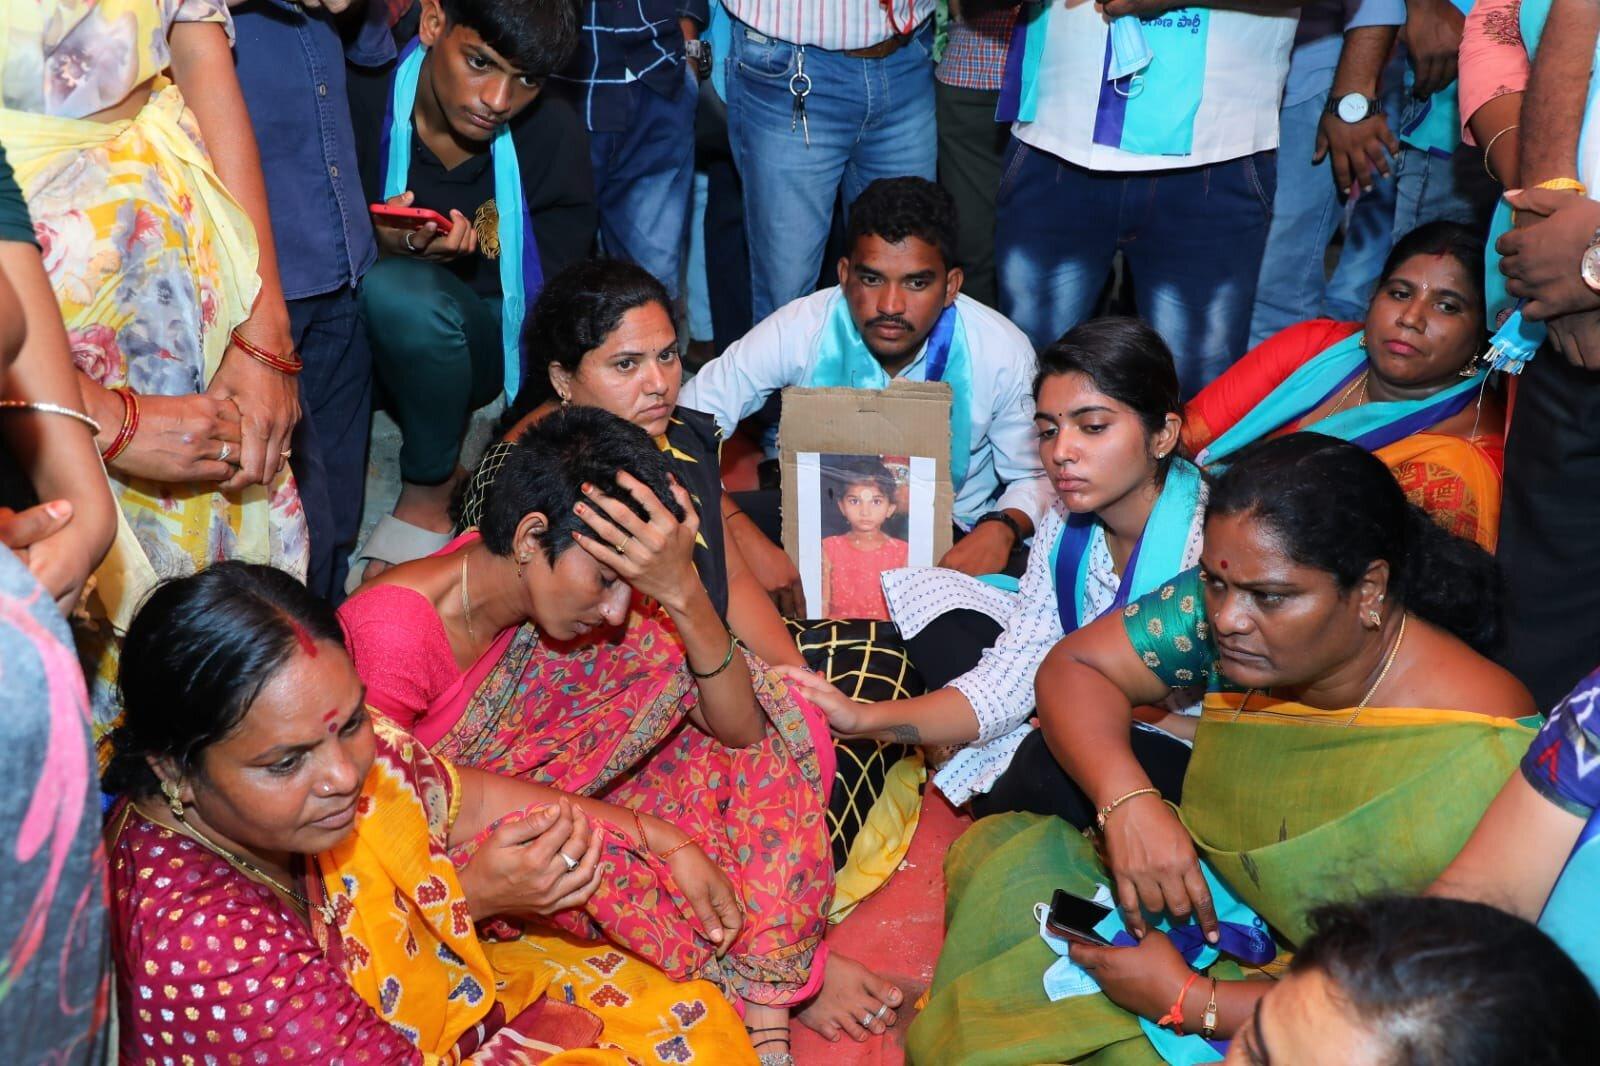 YS Sharmila: చిన్నారి చైత్ర పేరంట్స్కు షర్మిల పరామర్శ (ఫోటోలు)